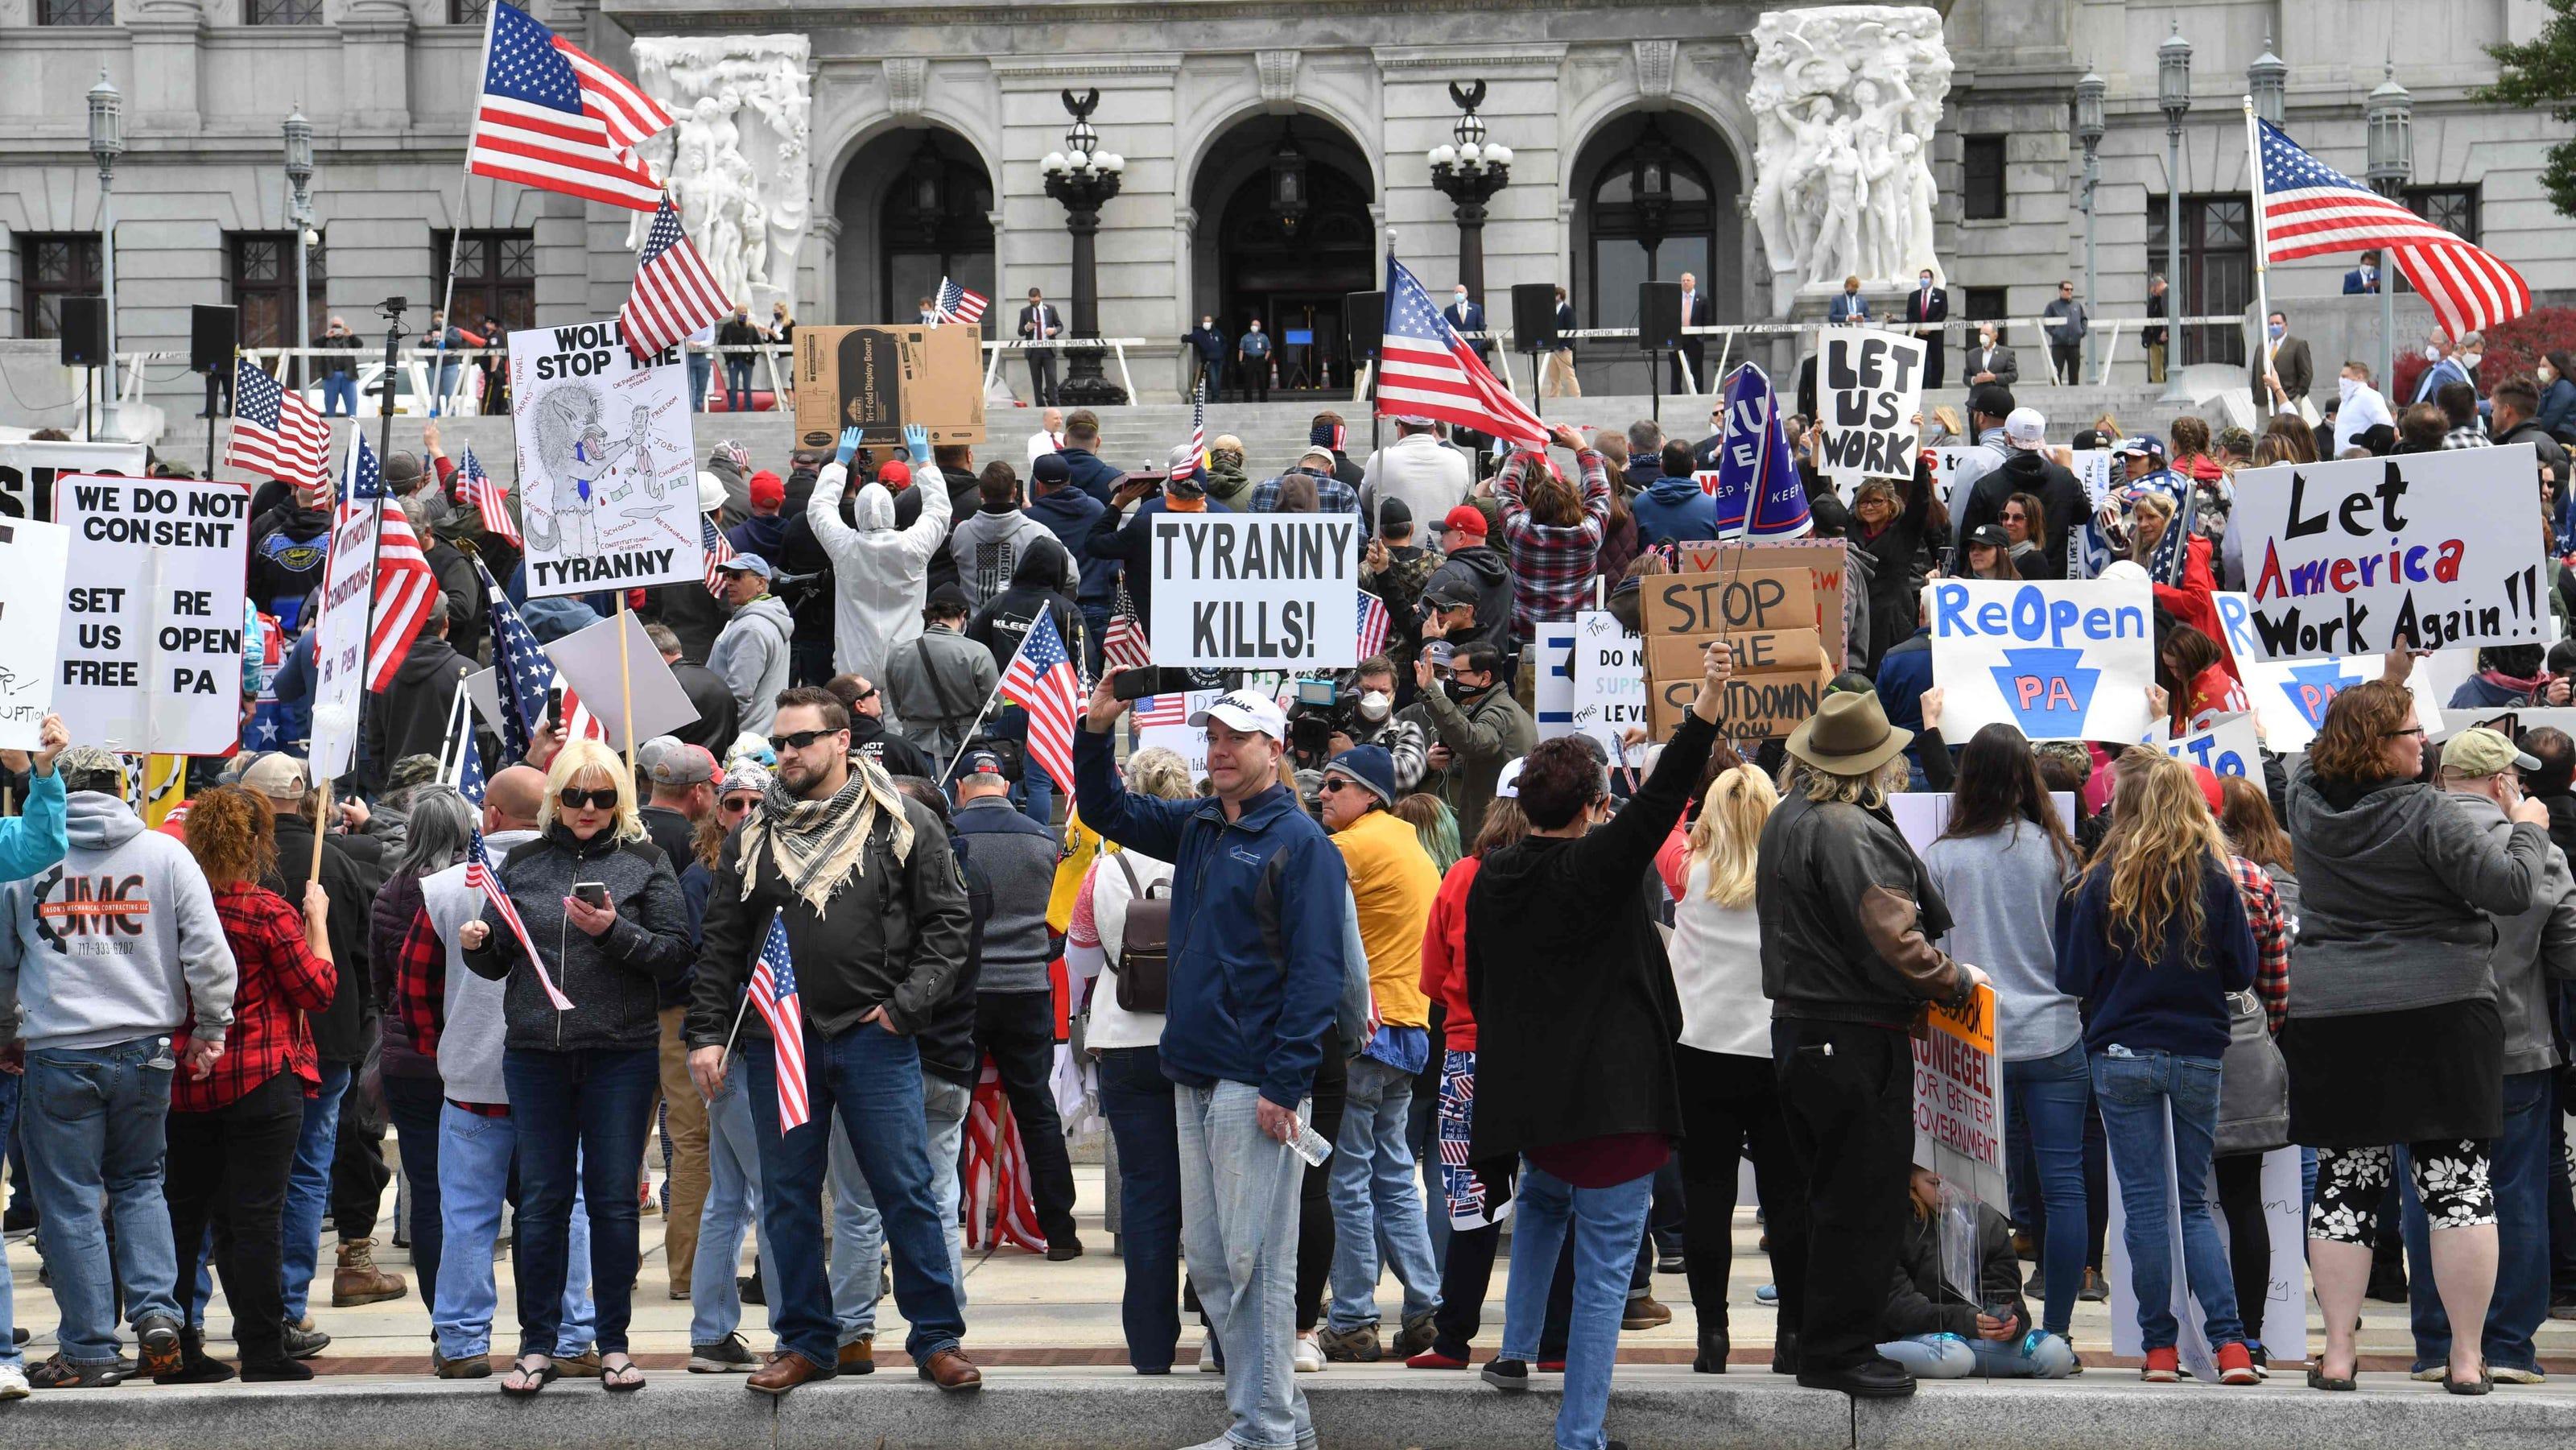 Coronovius: Anti-quarantine protest in Pennsylvania draws about 2,000